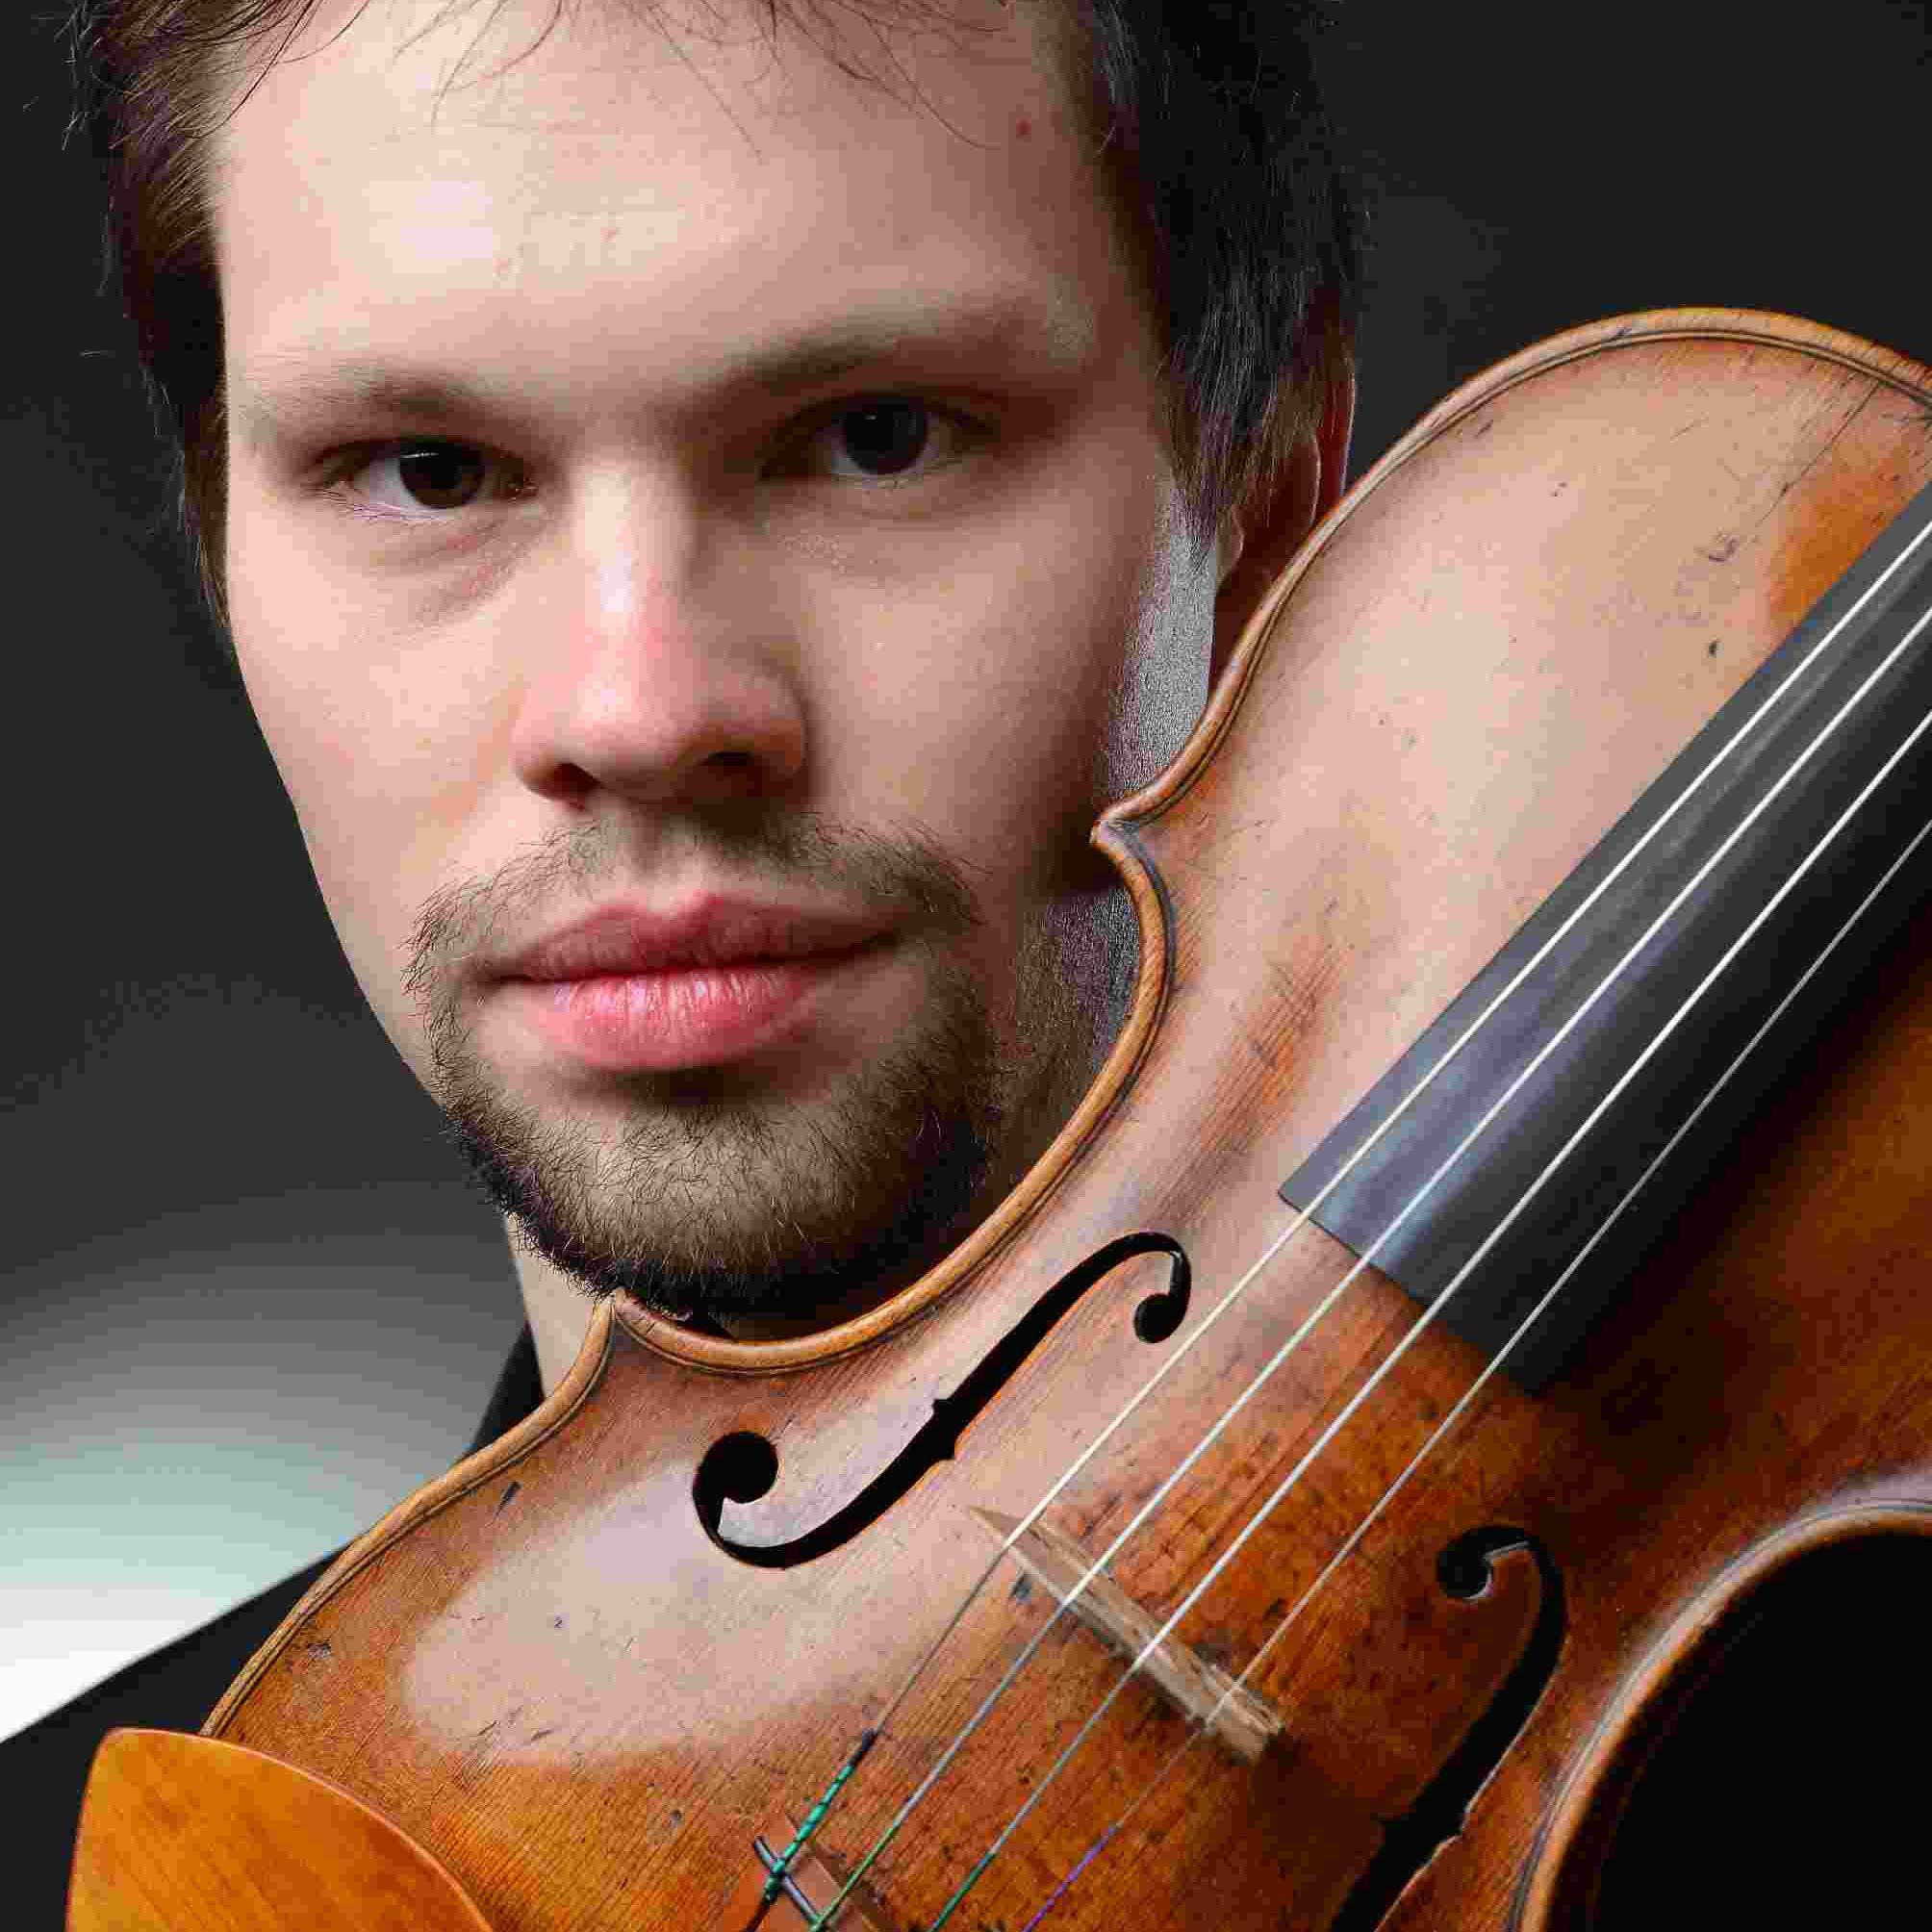 Marco Graziani, violin - Youngmasters Summer School 2019